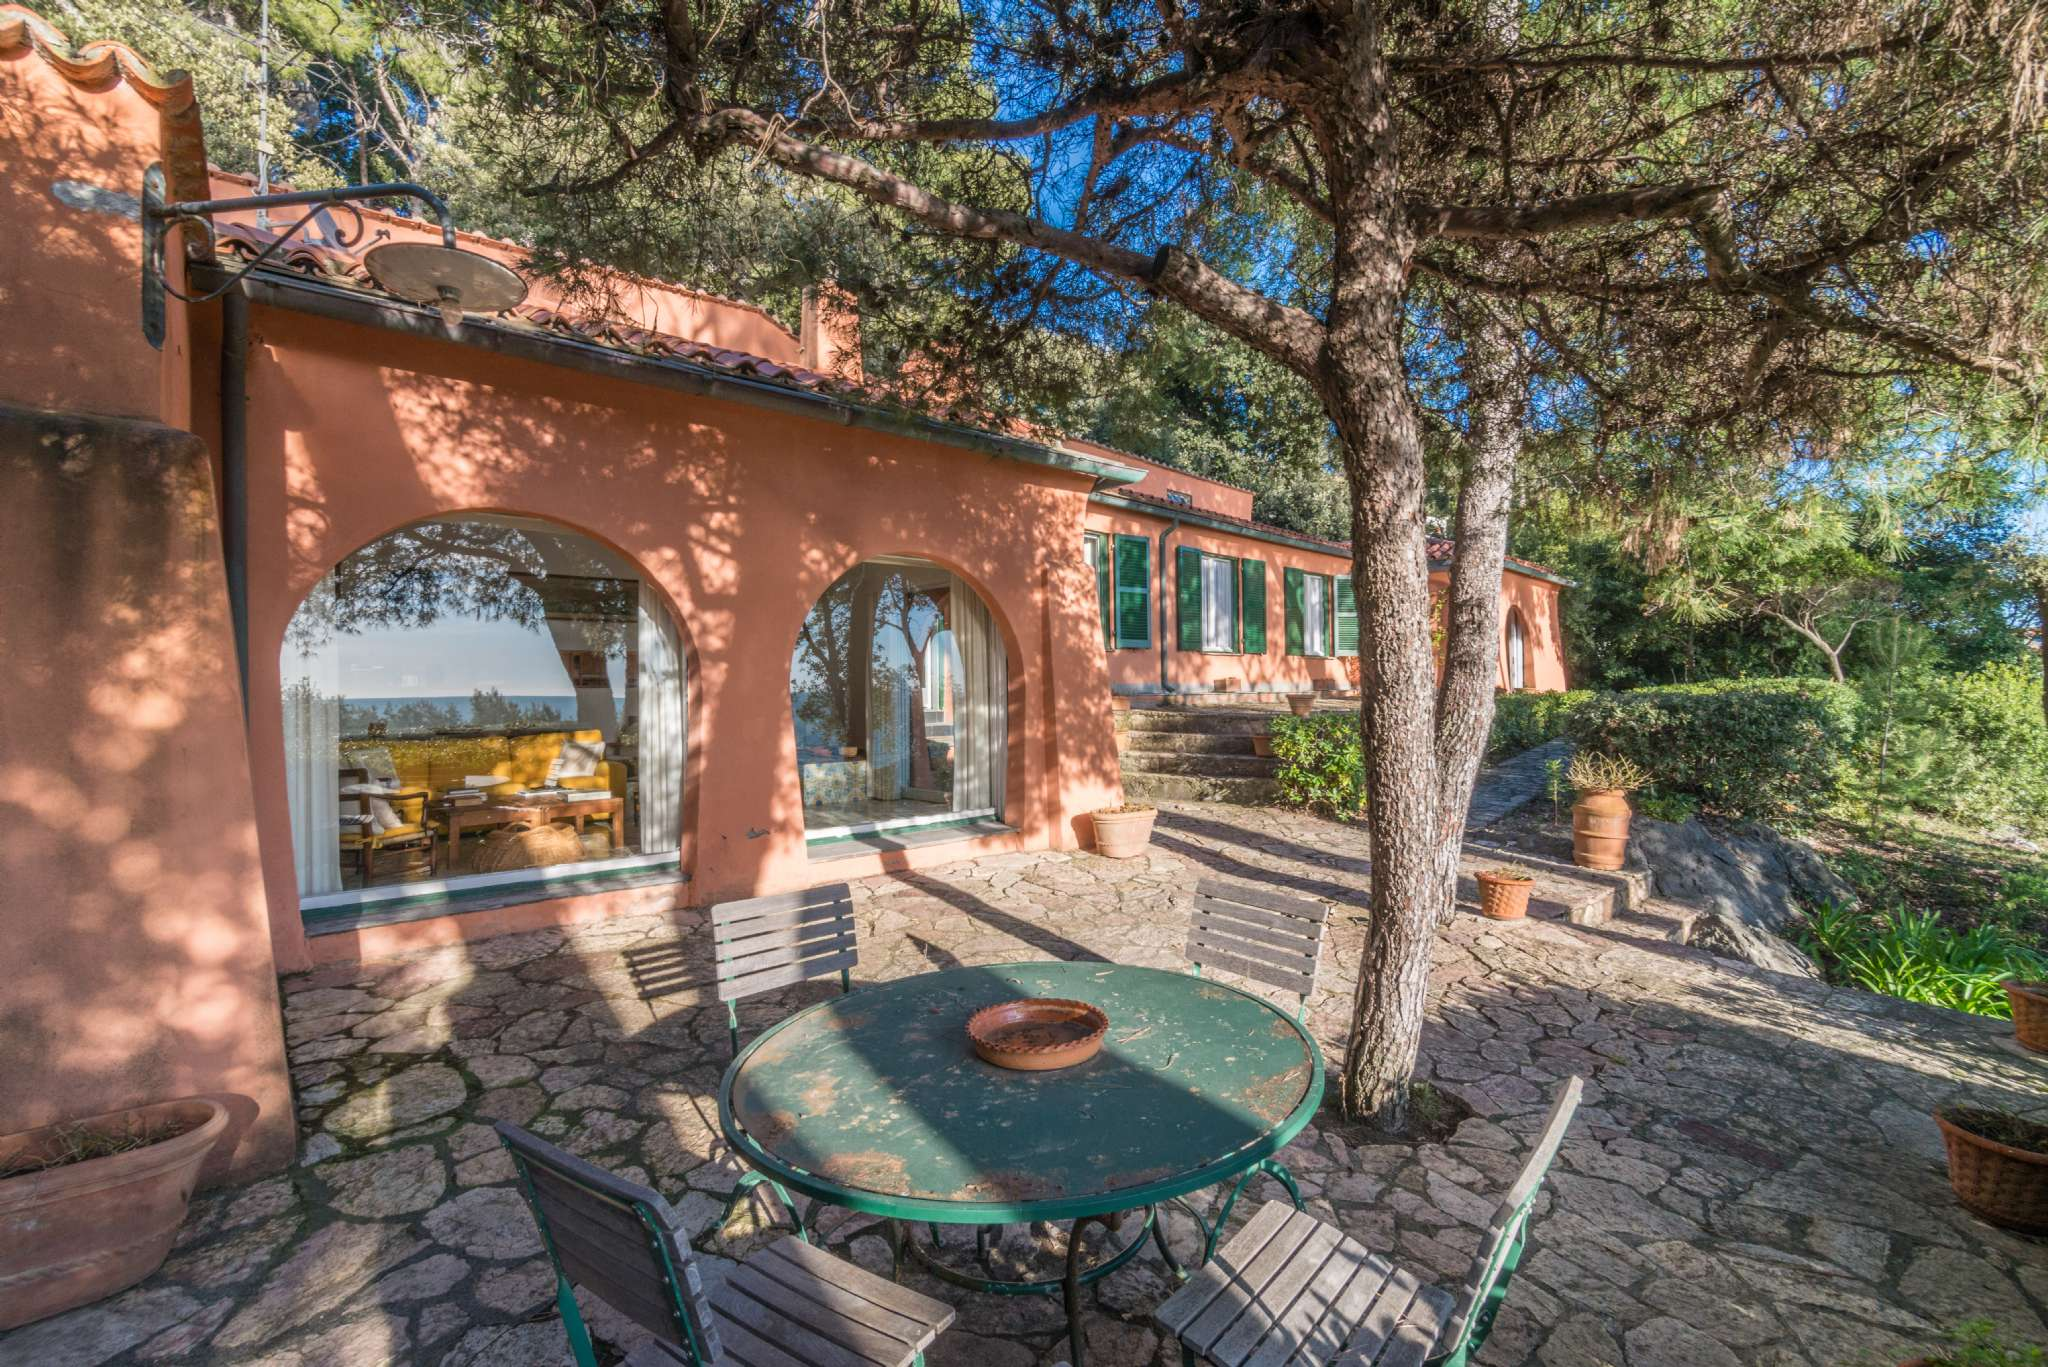 Villa in Vendita a Lerici: 5 locali, 300 mq - Foto 7